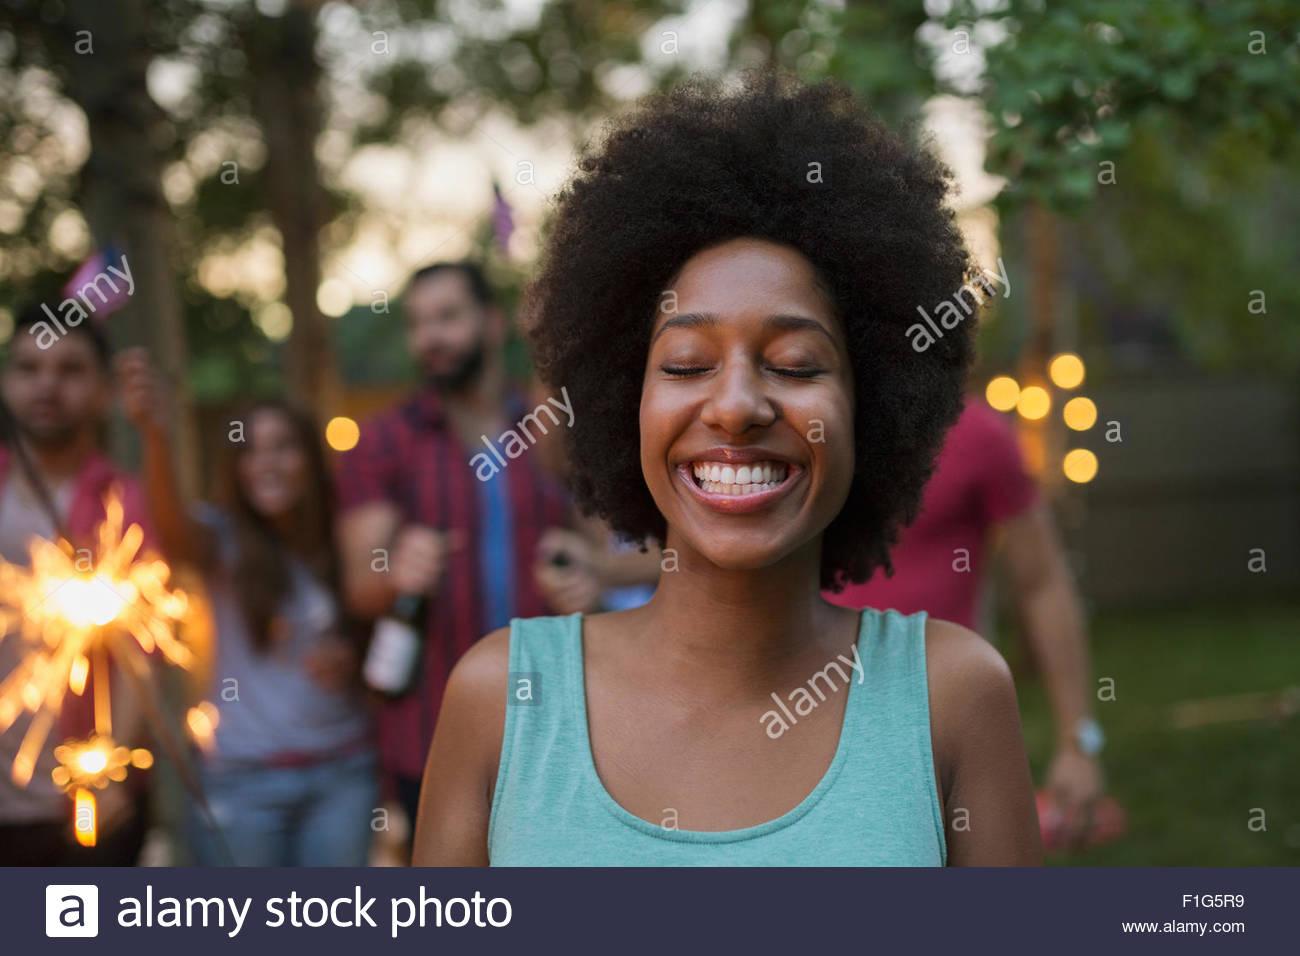 Begeisterte Frau mit Augen geschlossen halten Wunderkerze Hinterhof Stockbild